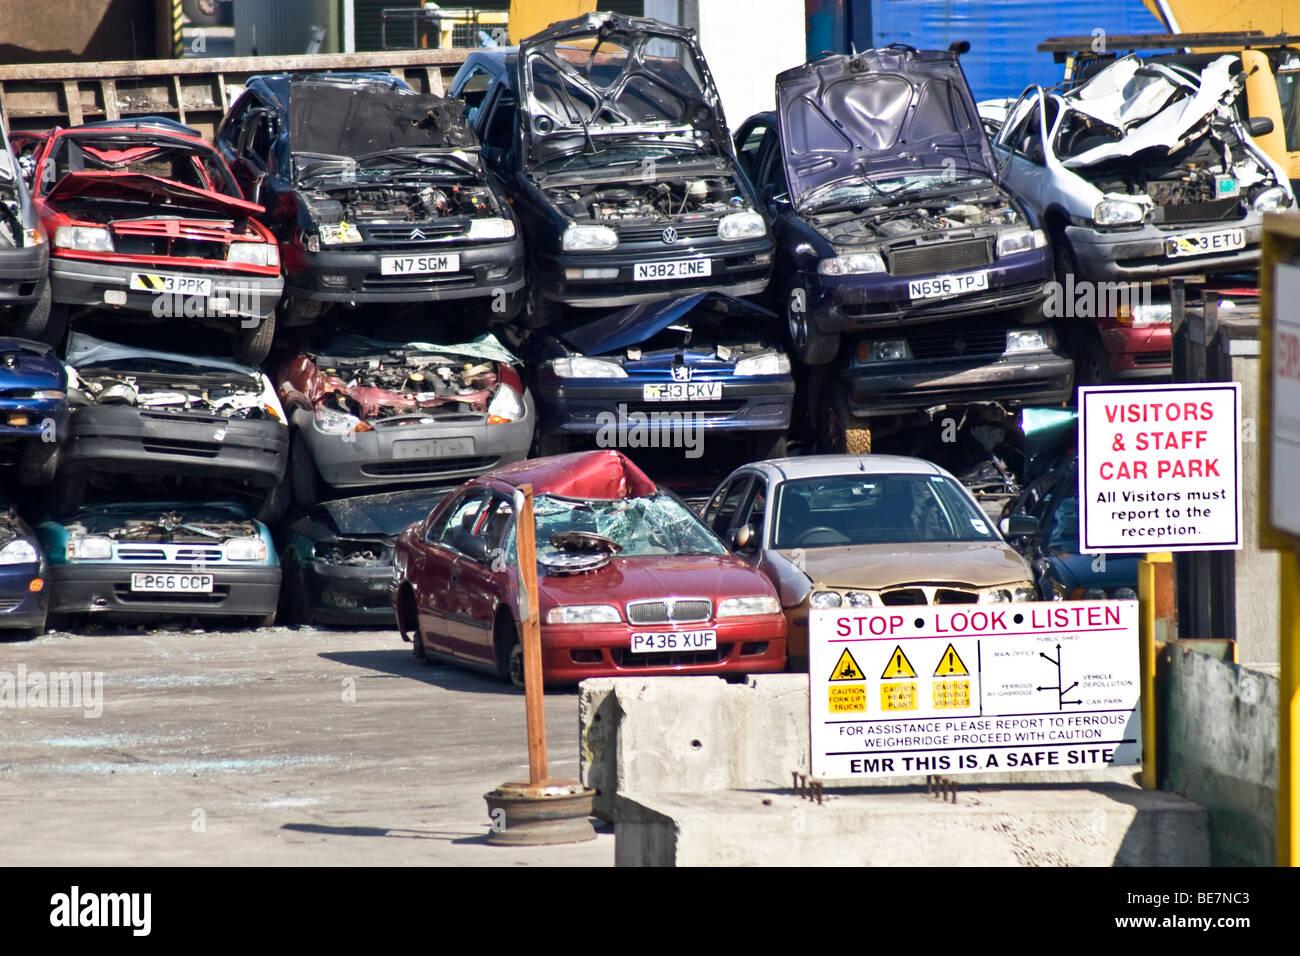 Scrap Yard Cars Uk Stock Photos & Scrap Yard Cars Uk Stock Images ...